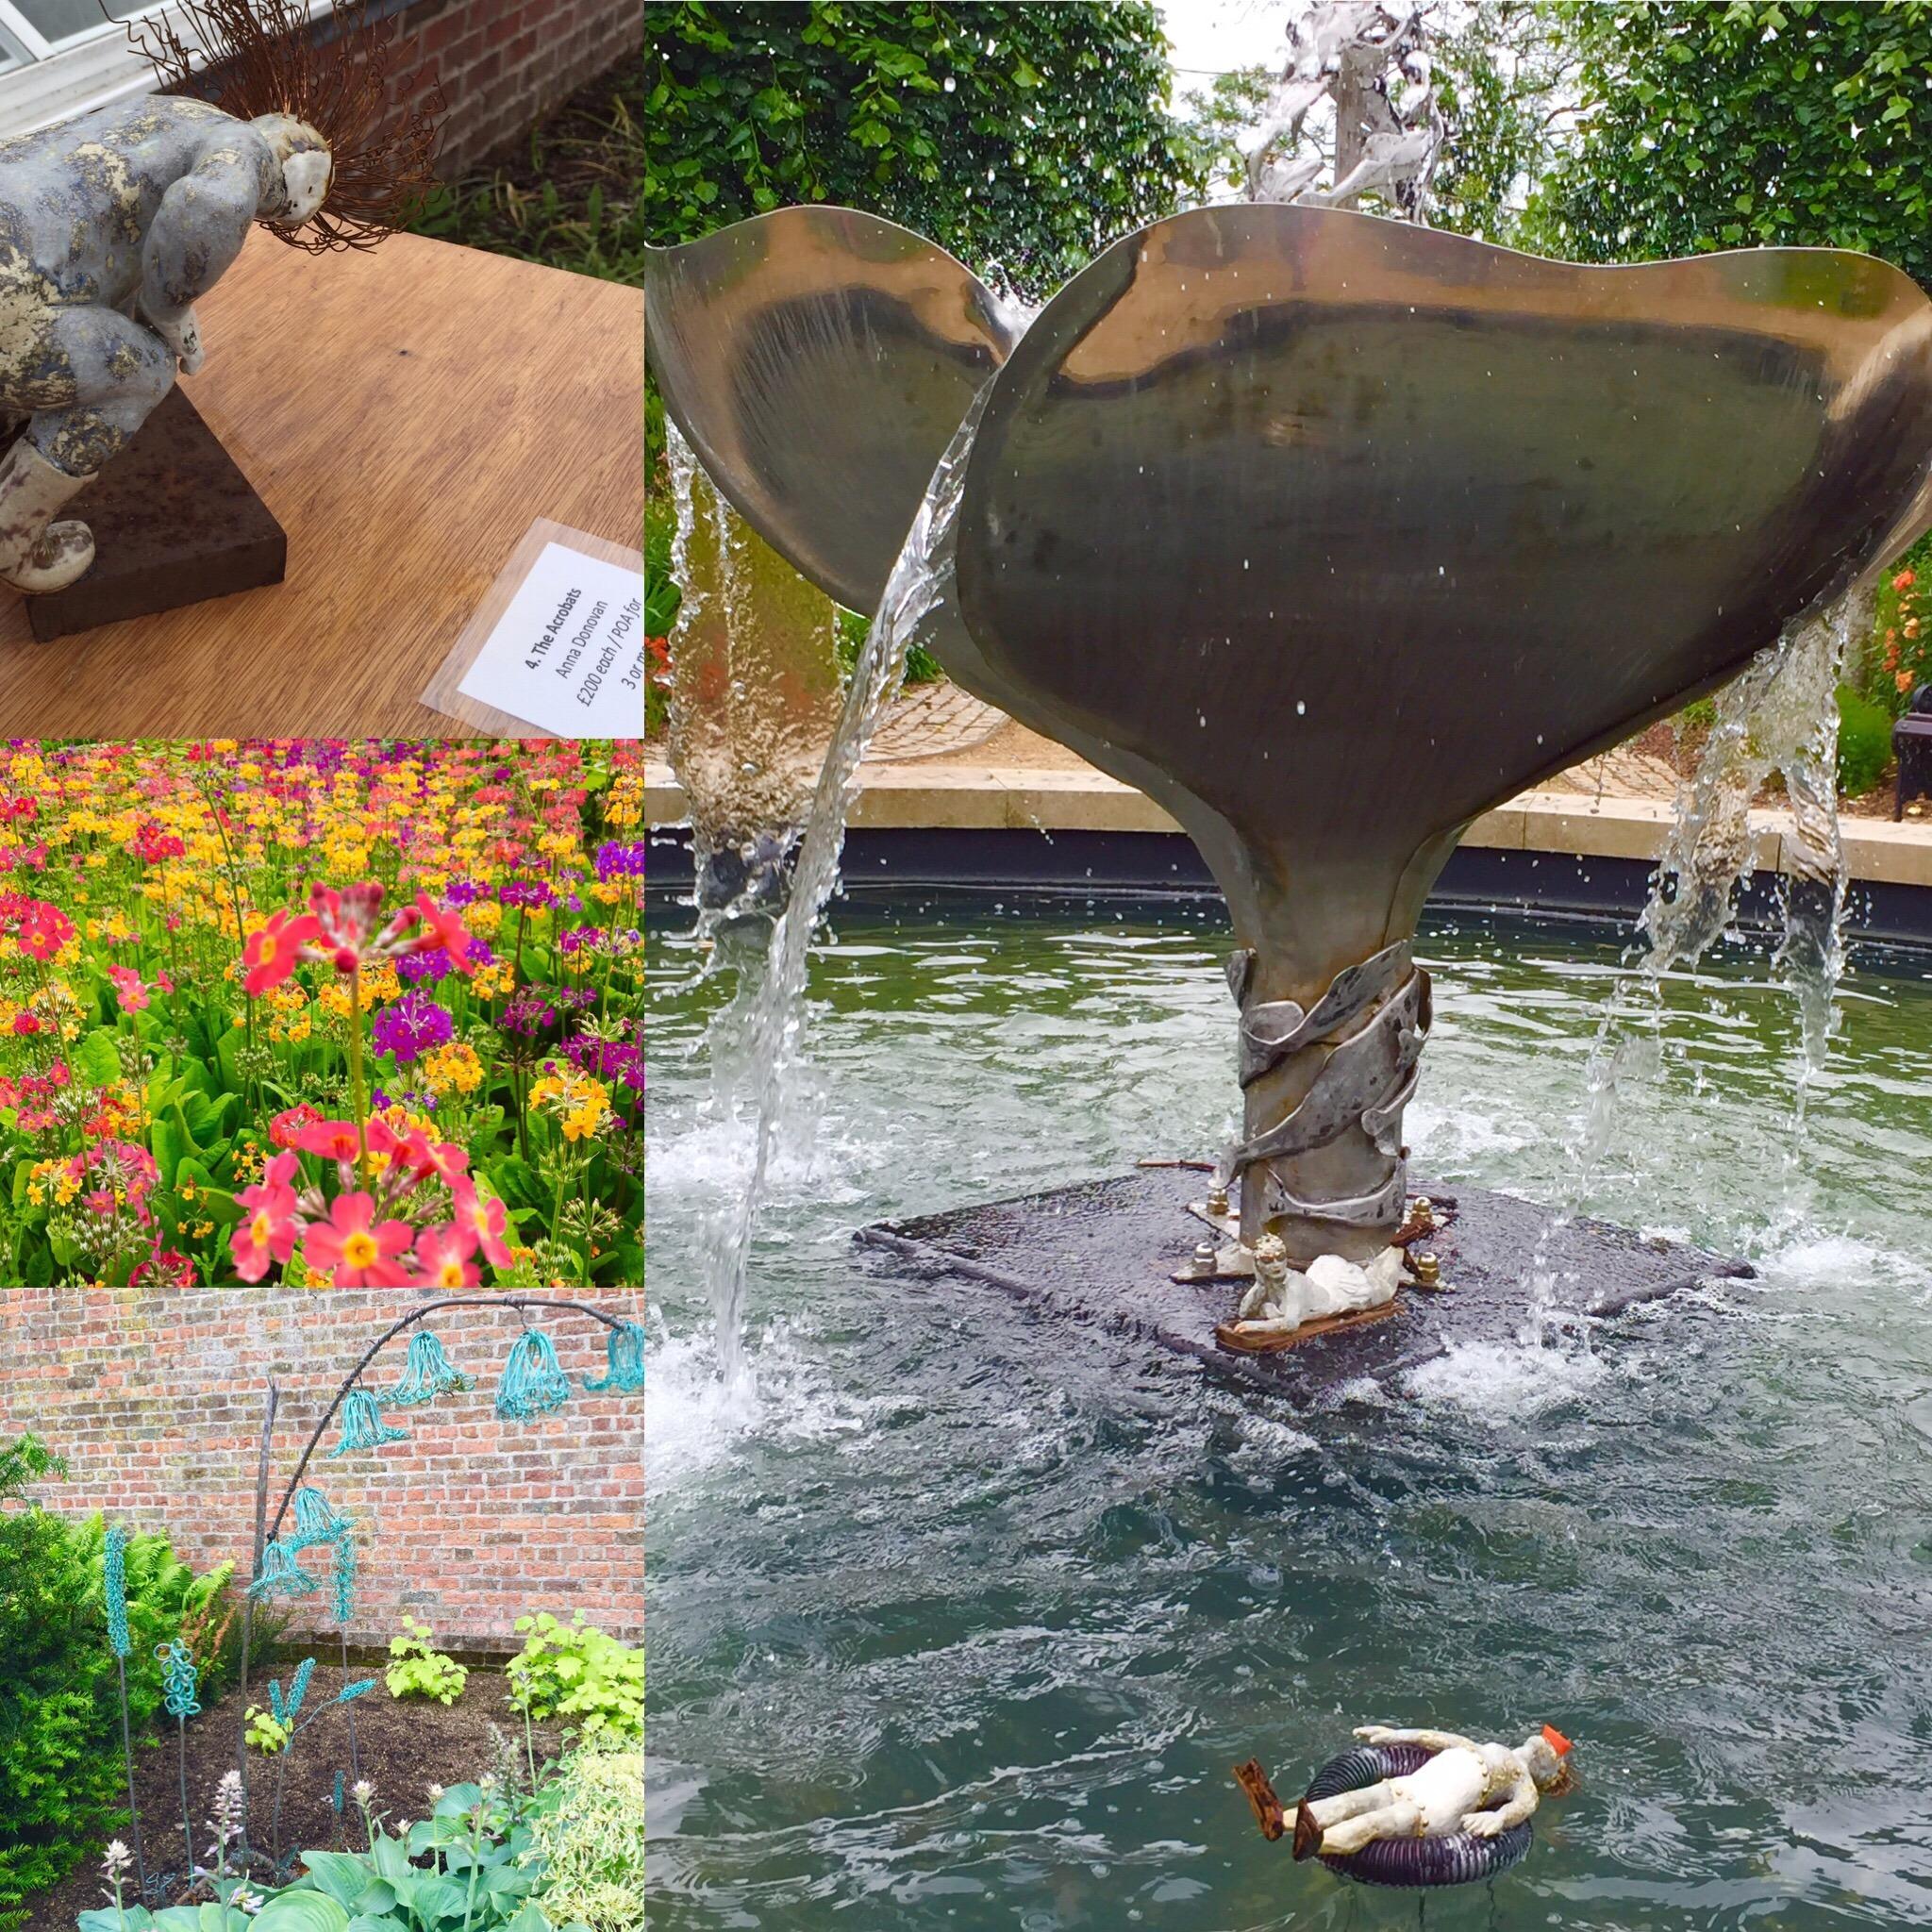 Bangor, Walled Garden, Sculpture Exhibition, Flowers, Beauty